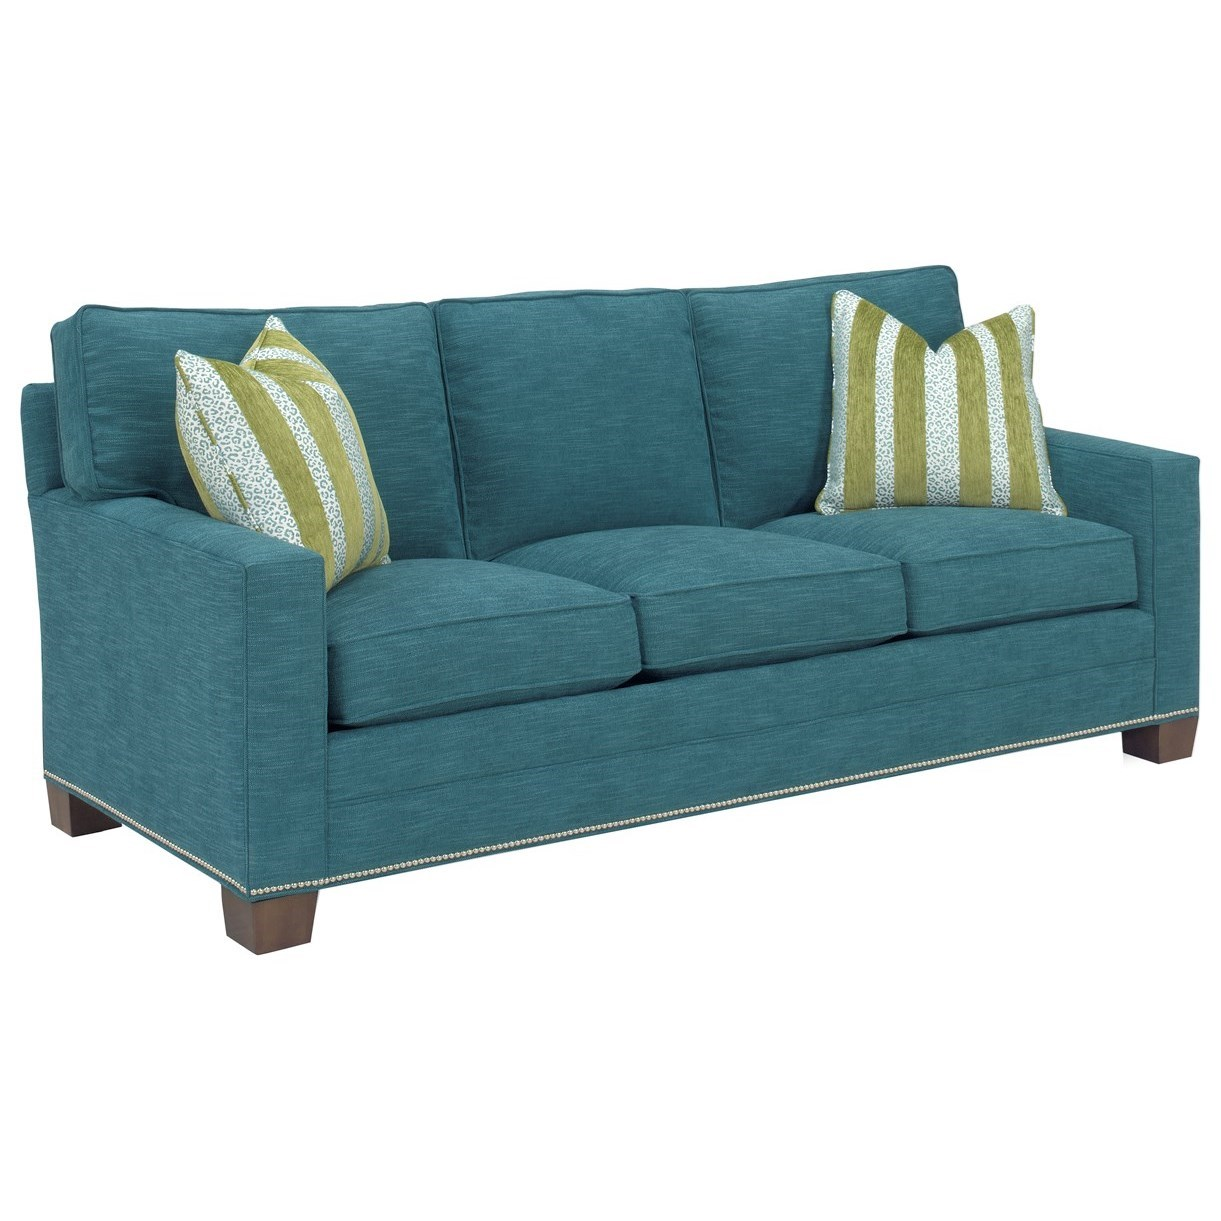 Personal Design Series Bristol Customizable Sofa by Lexington at Johnny Janosik